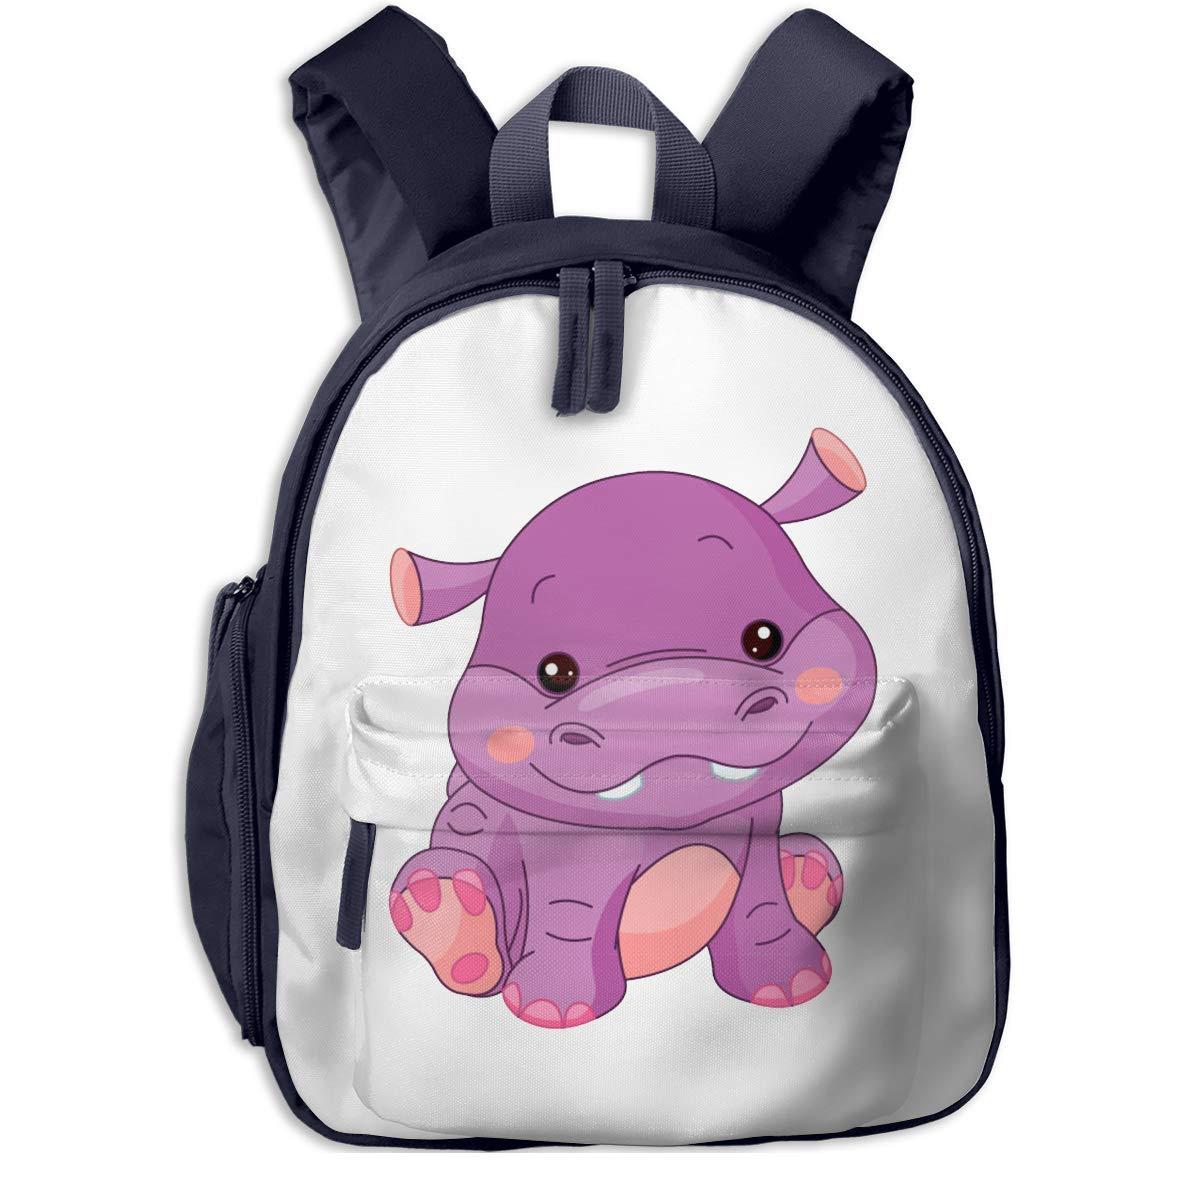 Sd4r5y3hg School Backpack for for for Girls Boys, Kids Cute Cartoon lila Hippo Cartoon Backpacks Book Bag B07MGLC7XN Daypacks Moderner Modus 8ca489